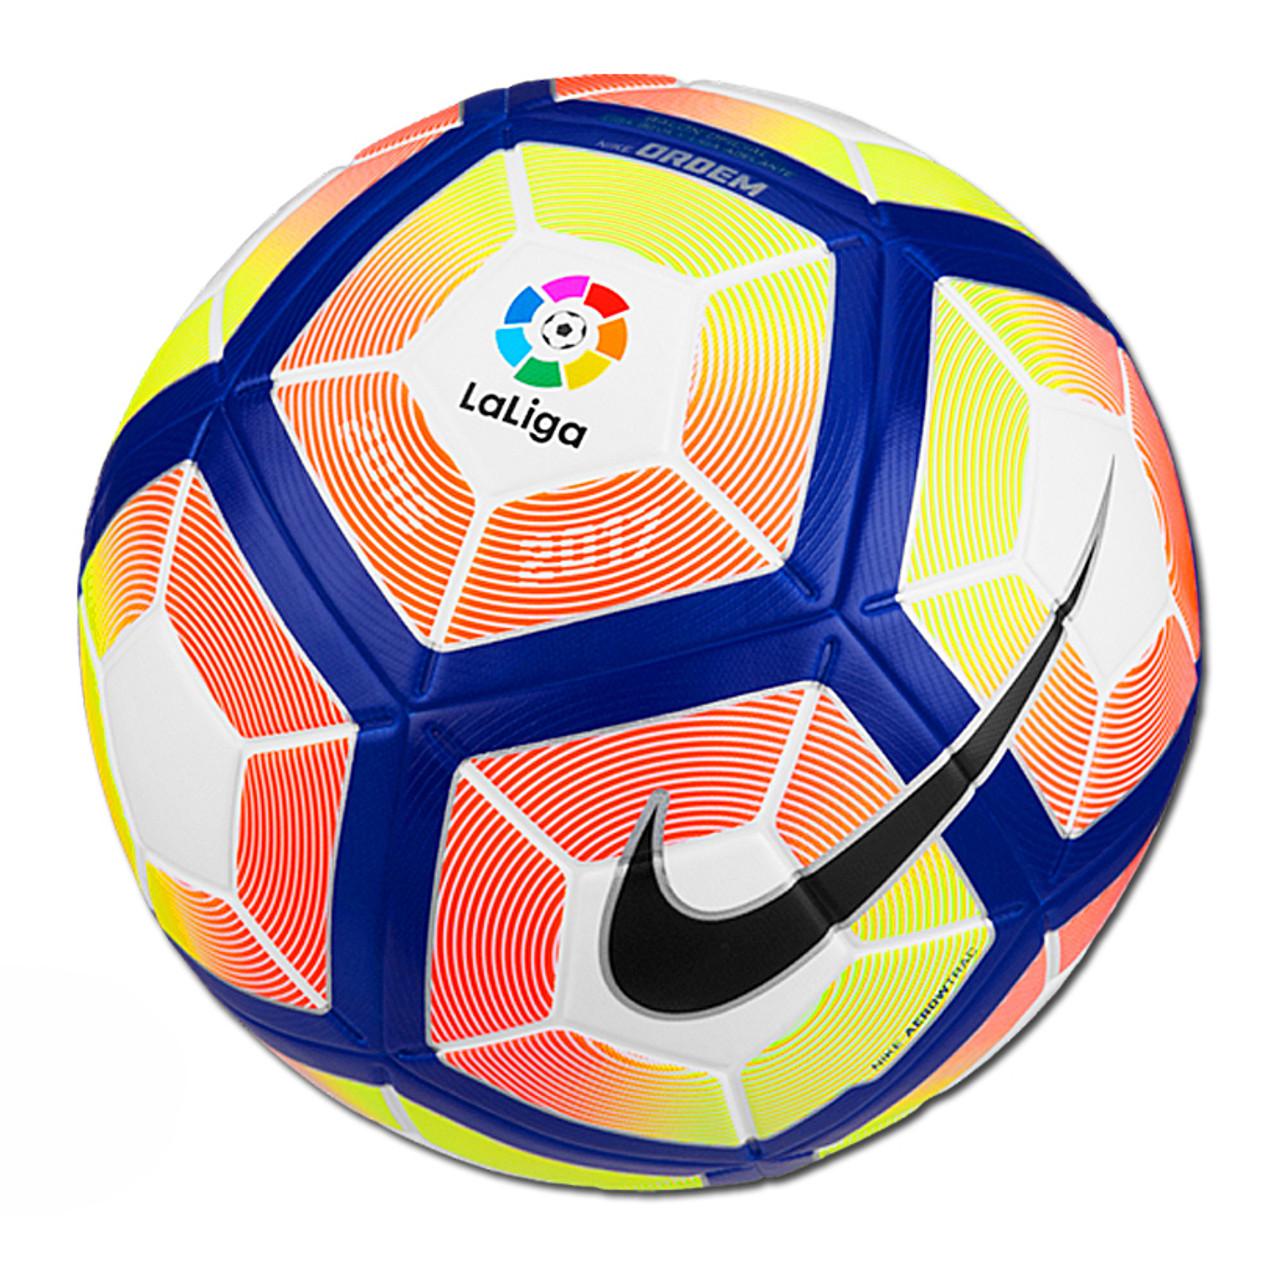 99ec248e0 Nike Ordem 4 La Liga Ball - White Orange Blue (41518) - ohp soccer